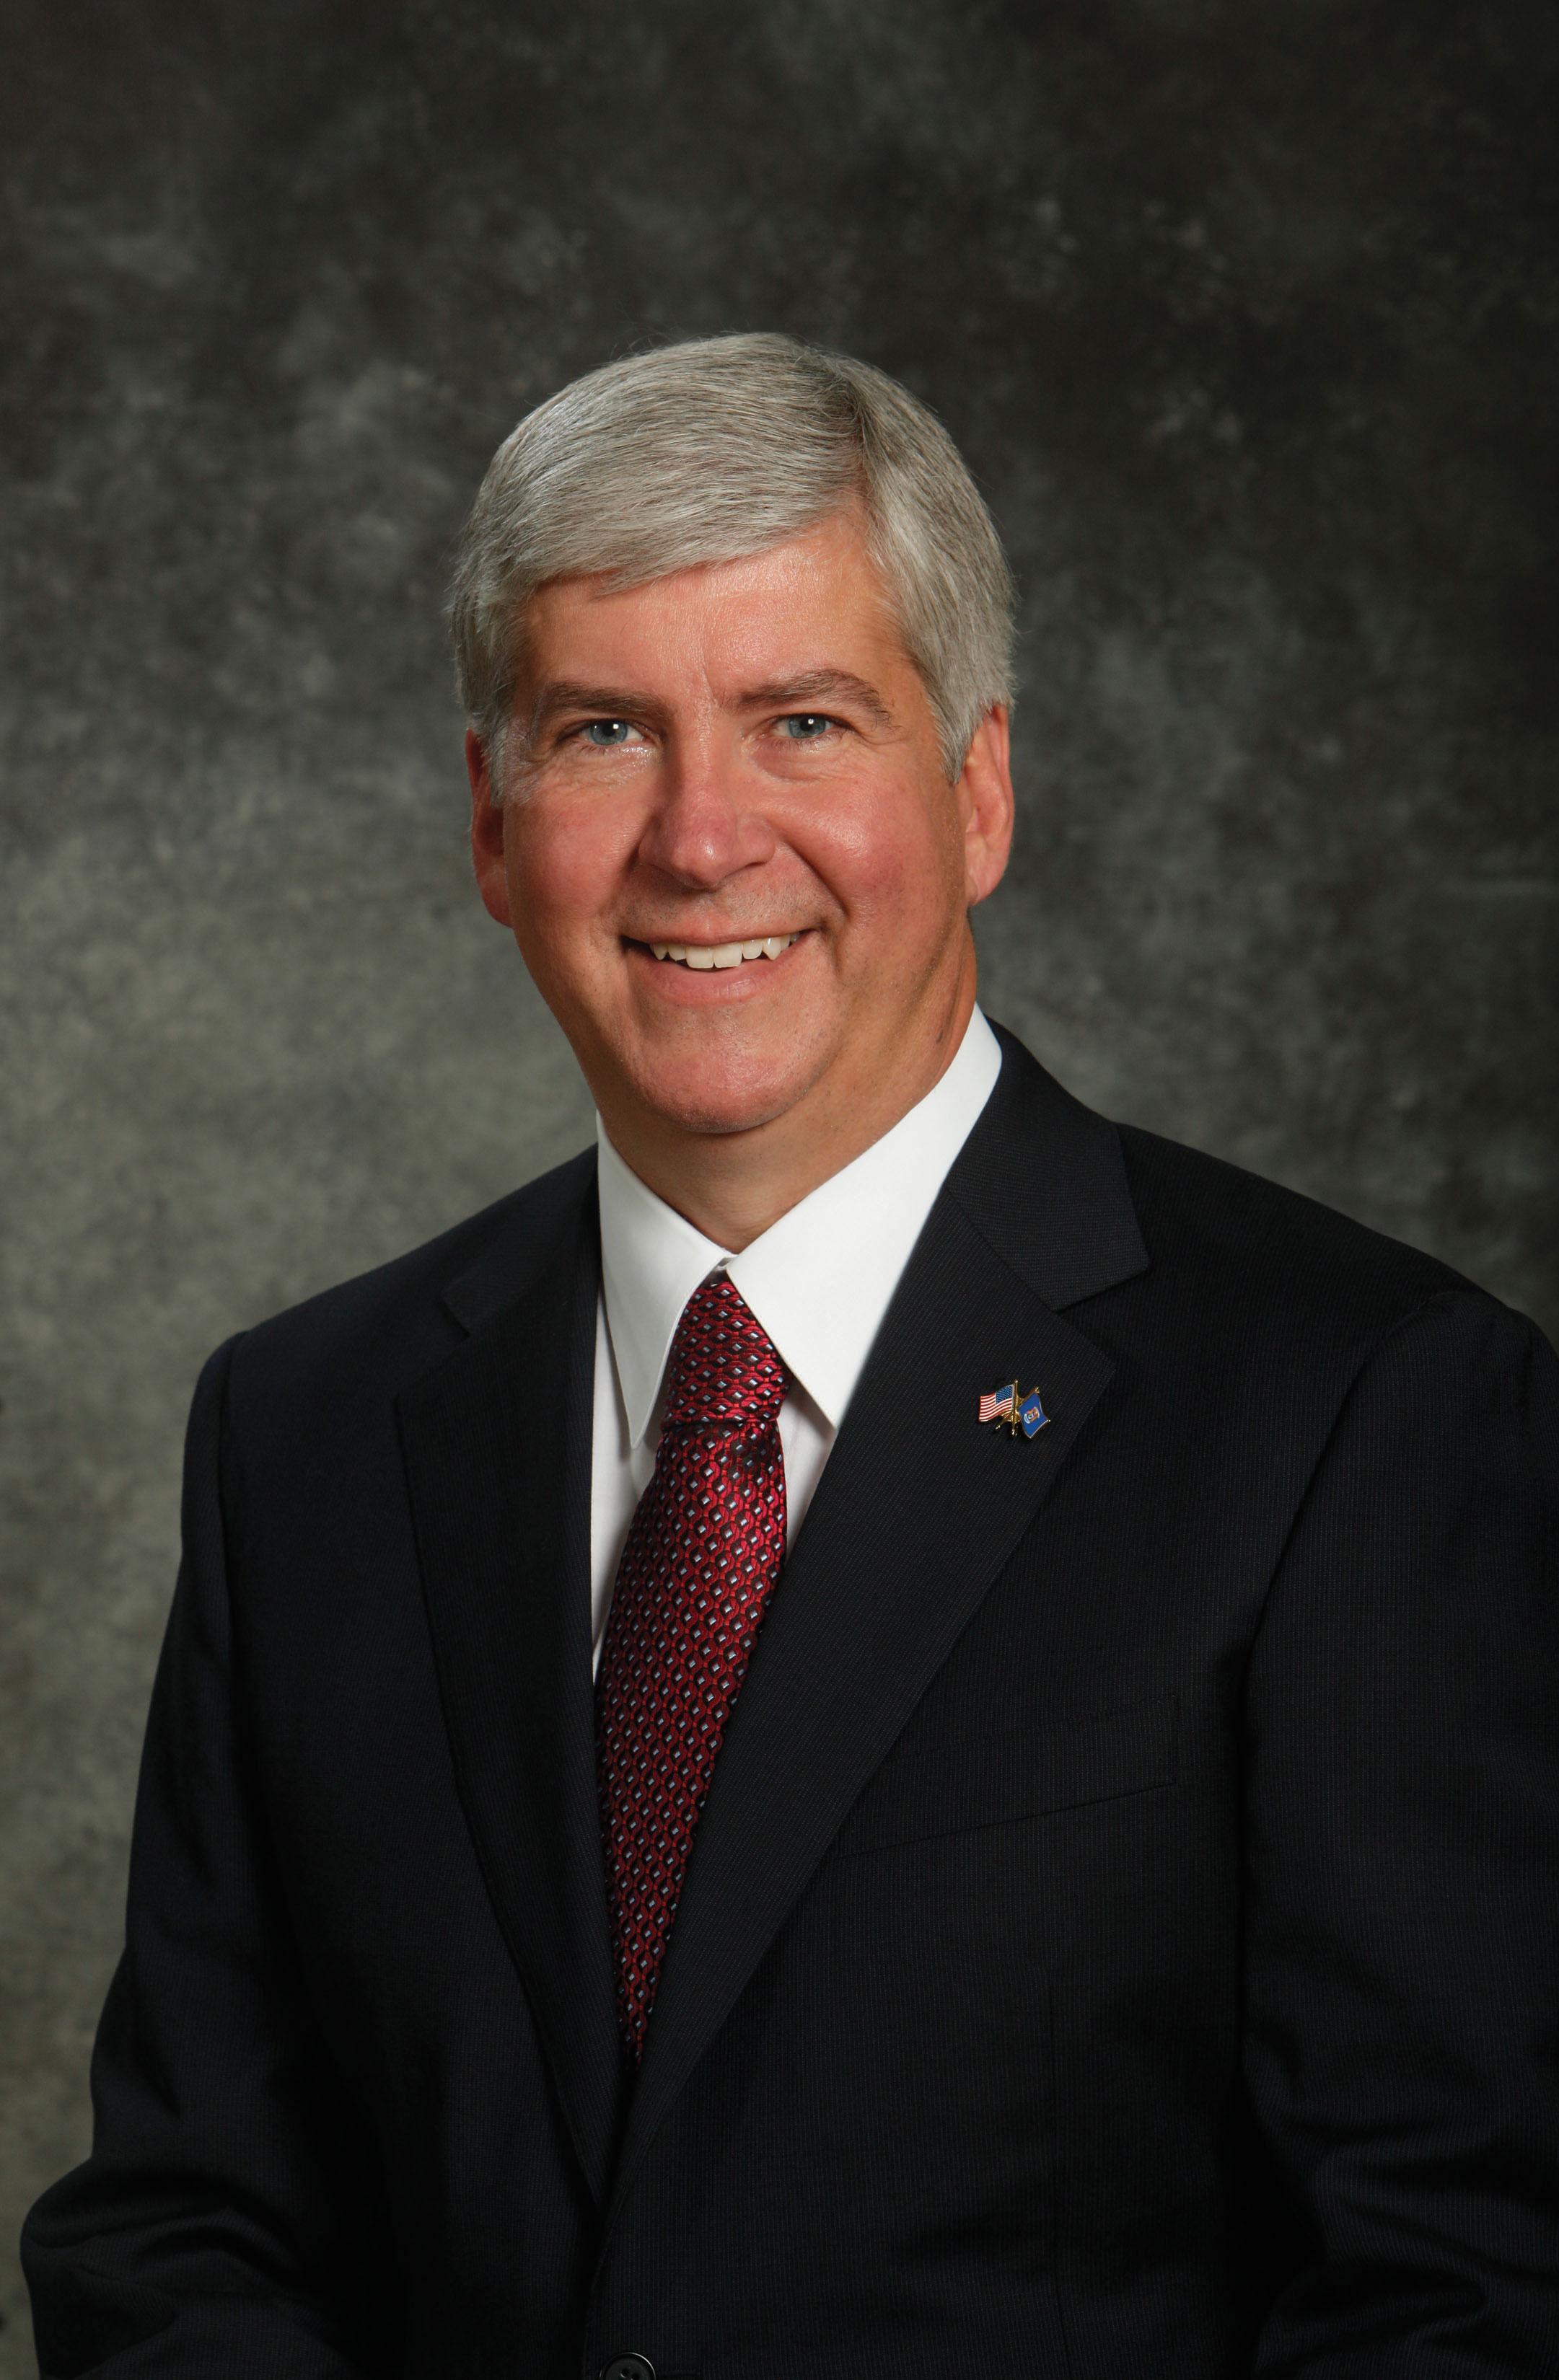 Governor Snyder headshot.jpg